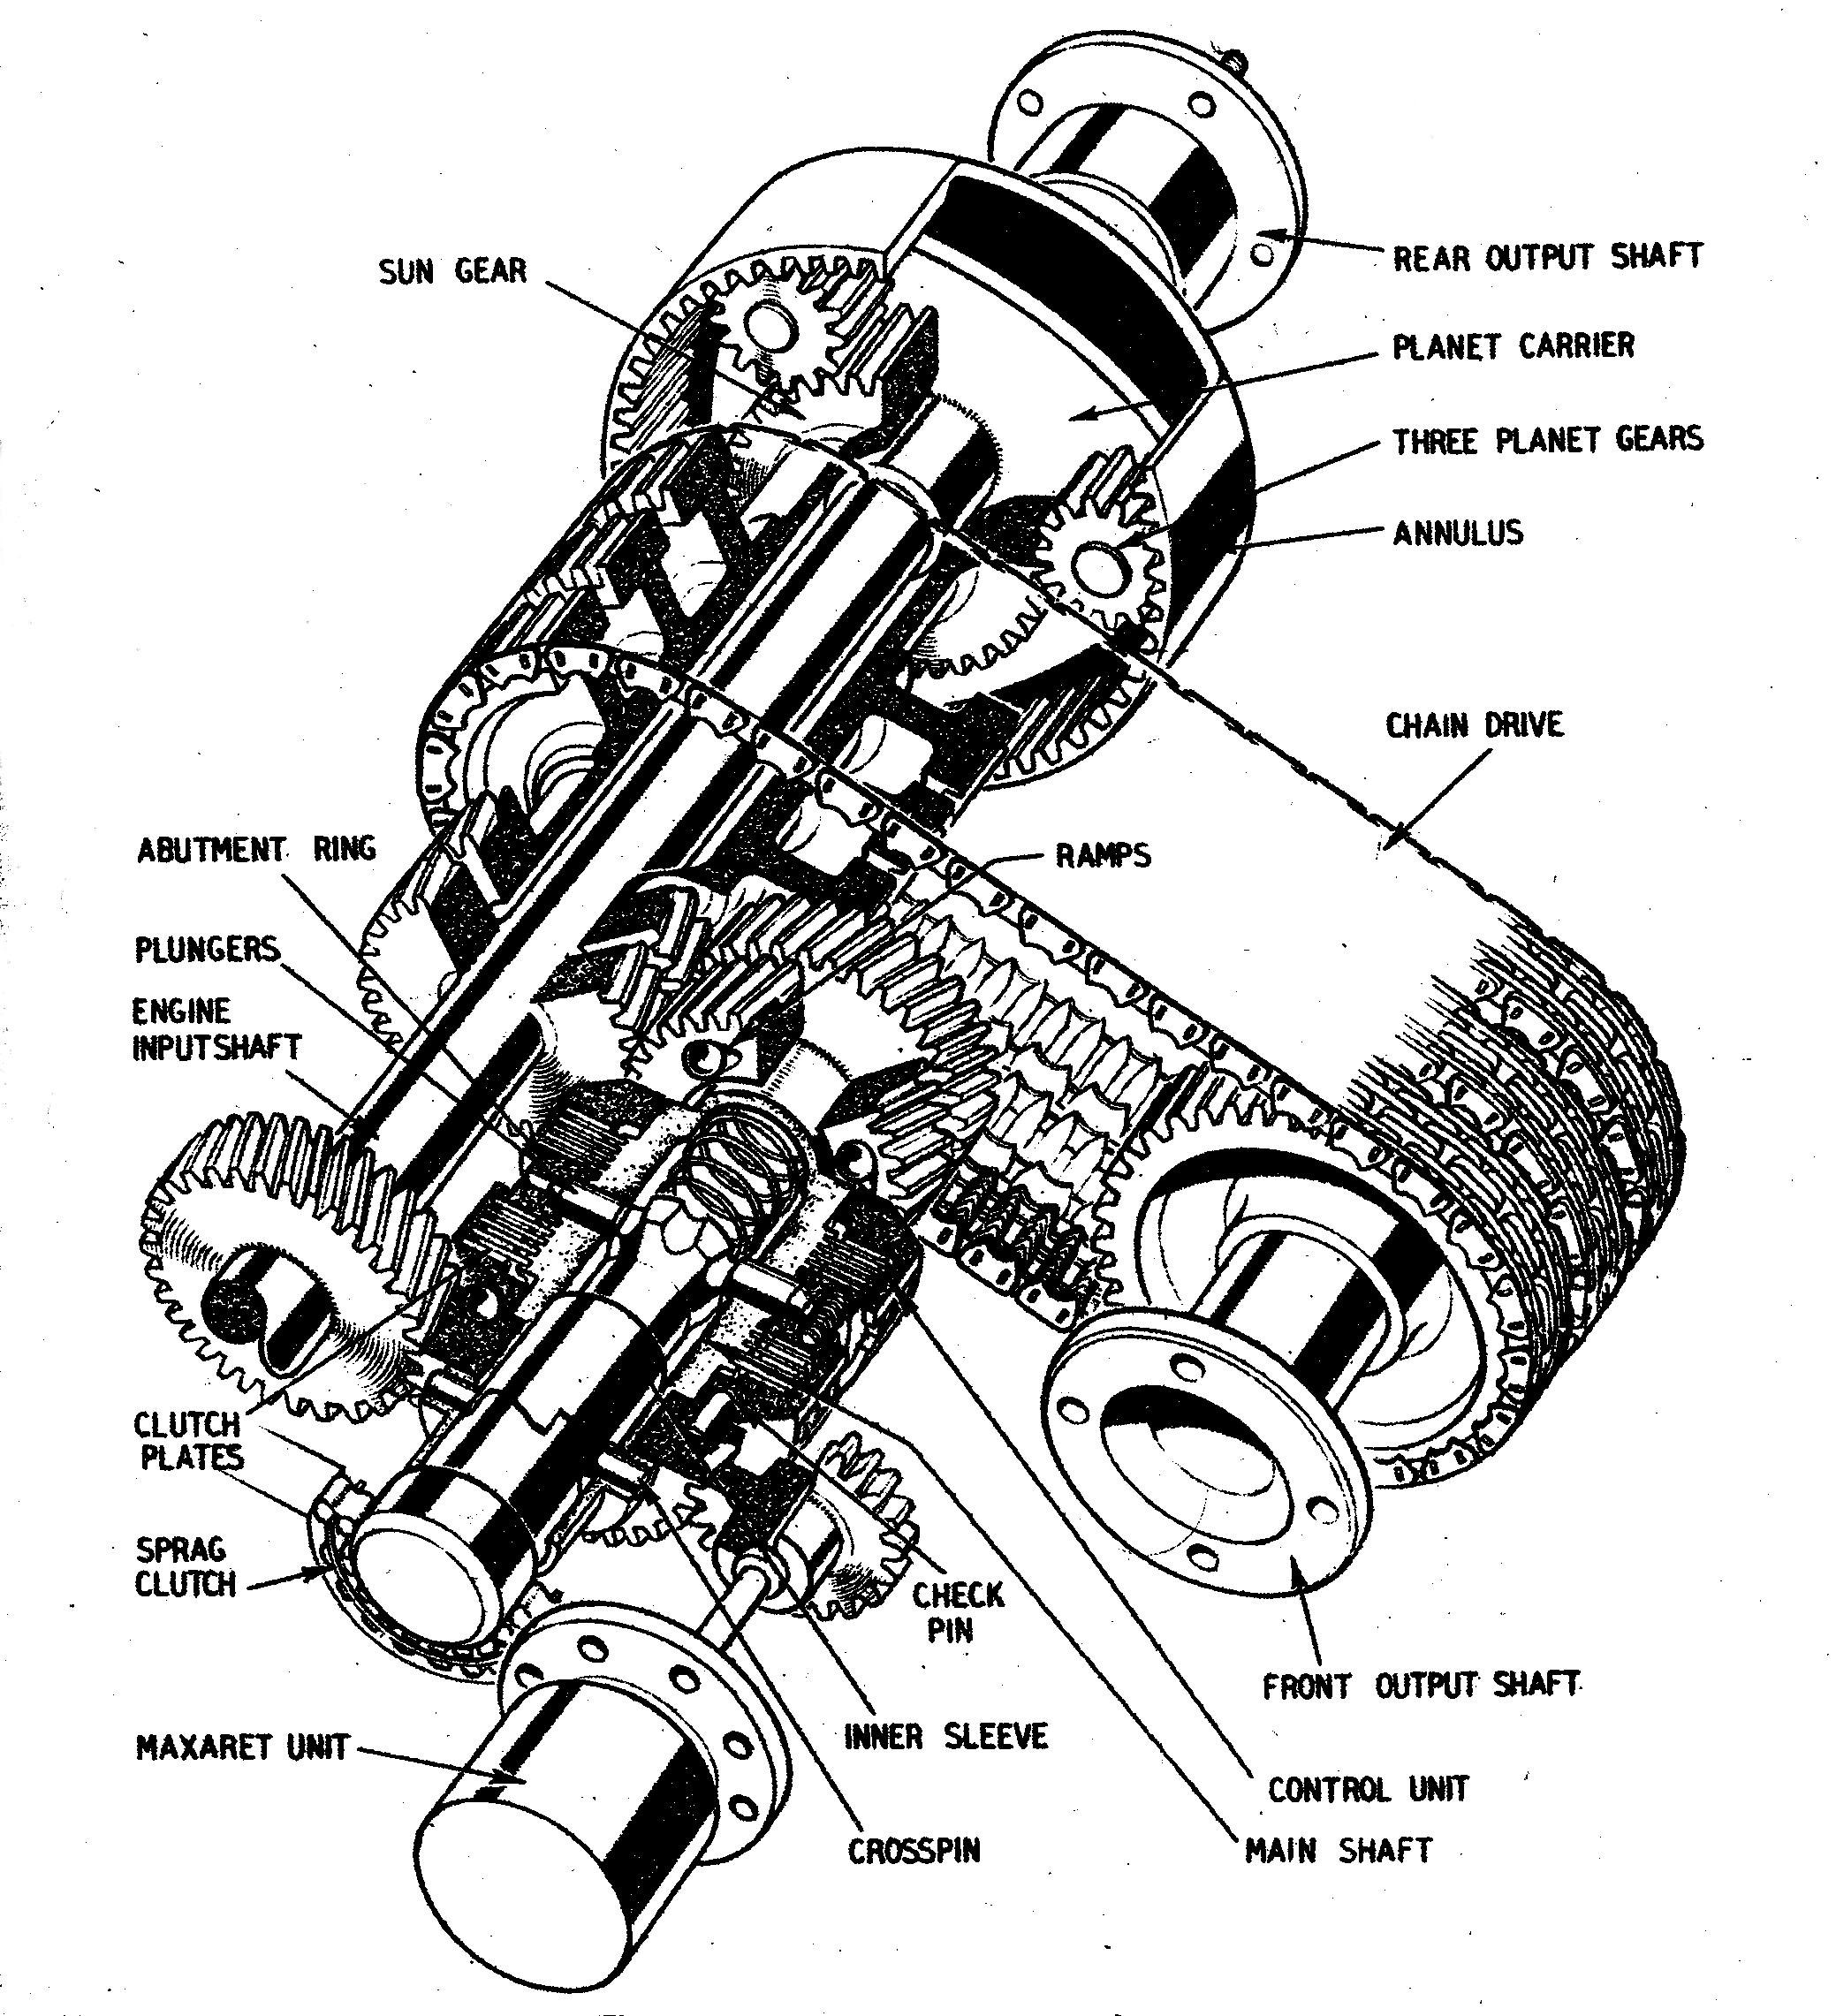 ferguson four-wheel-drive system explained